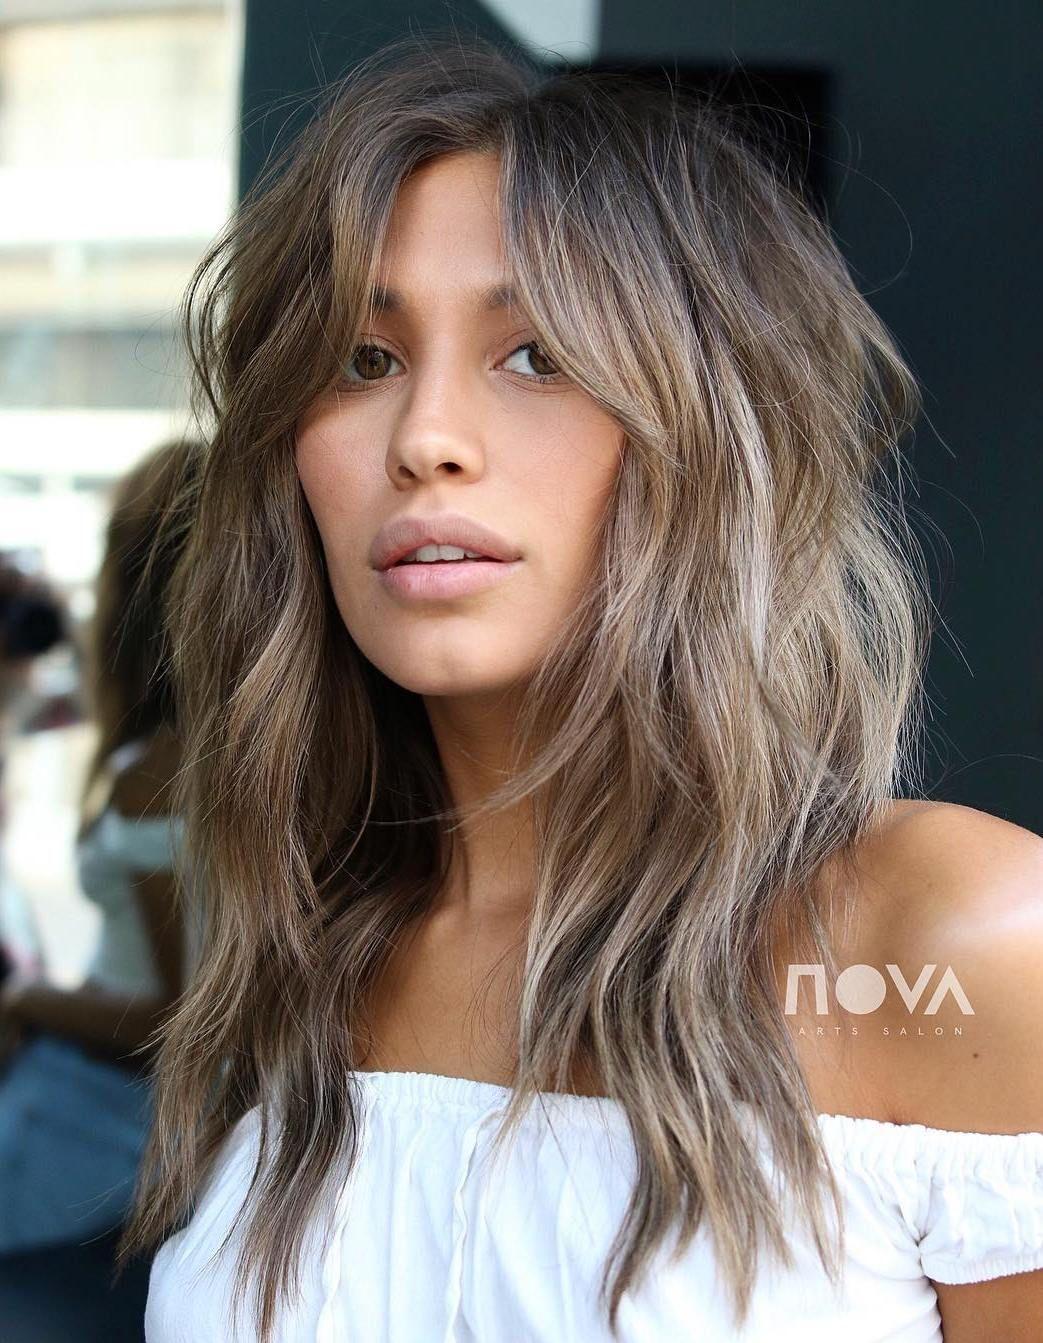 40 Modern Shag Haircuts For Women To Make A Splash Long Shag Haircut Long Hair With Bangs Haircuts For Long Hair